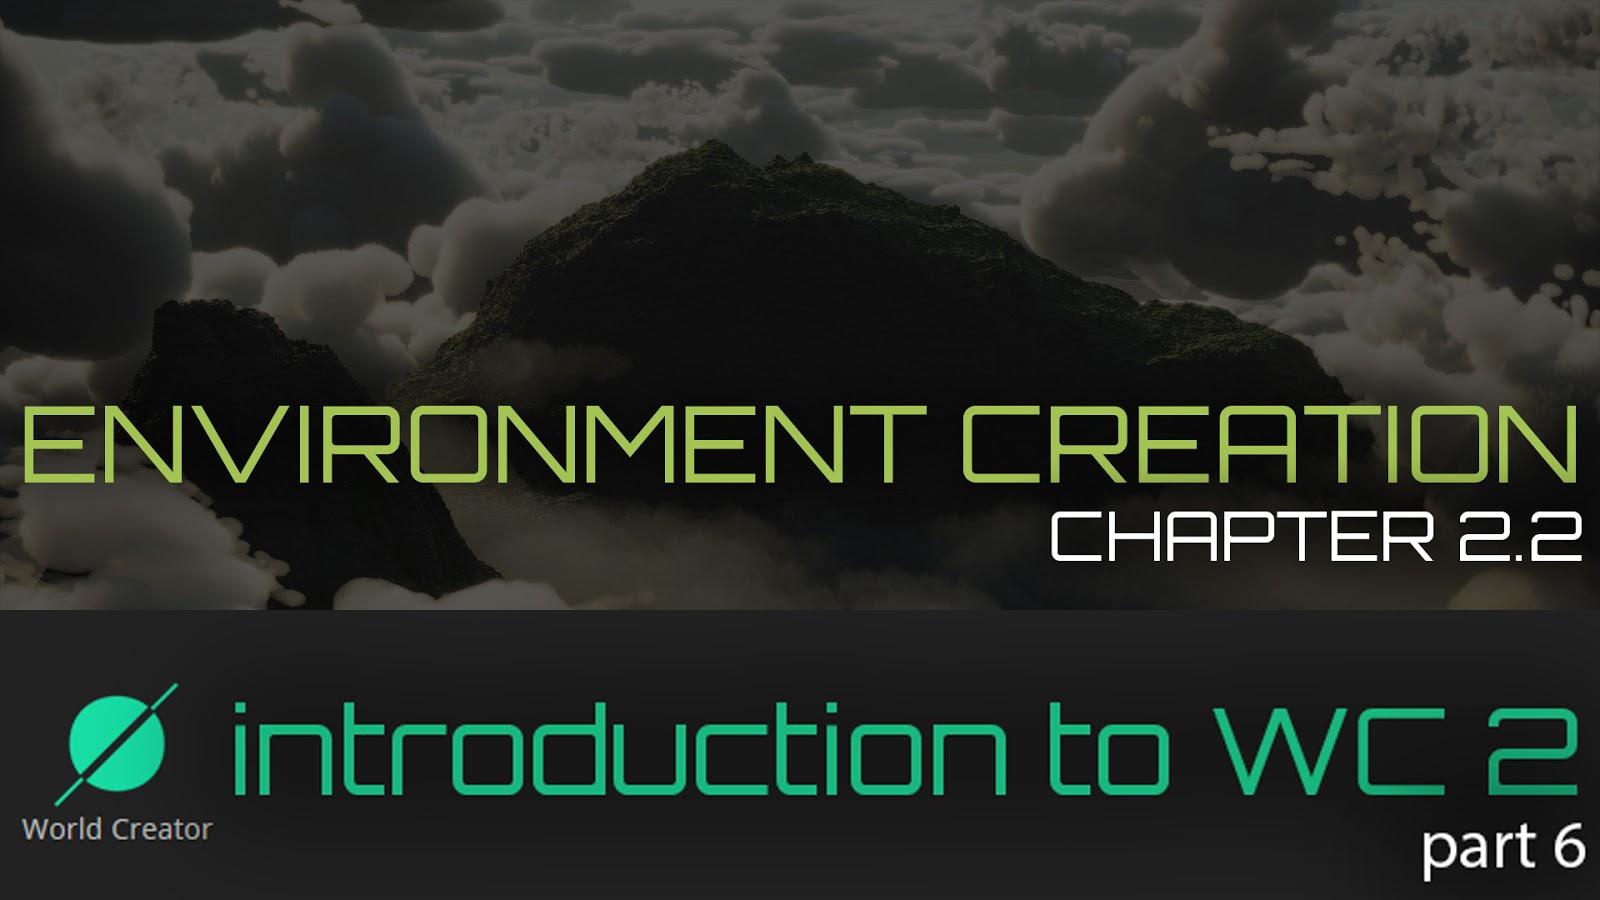 world_creator_part_6_youtube_prew.jpg